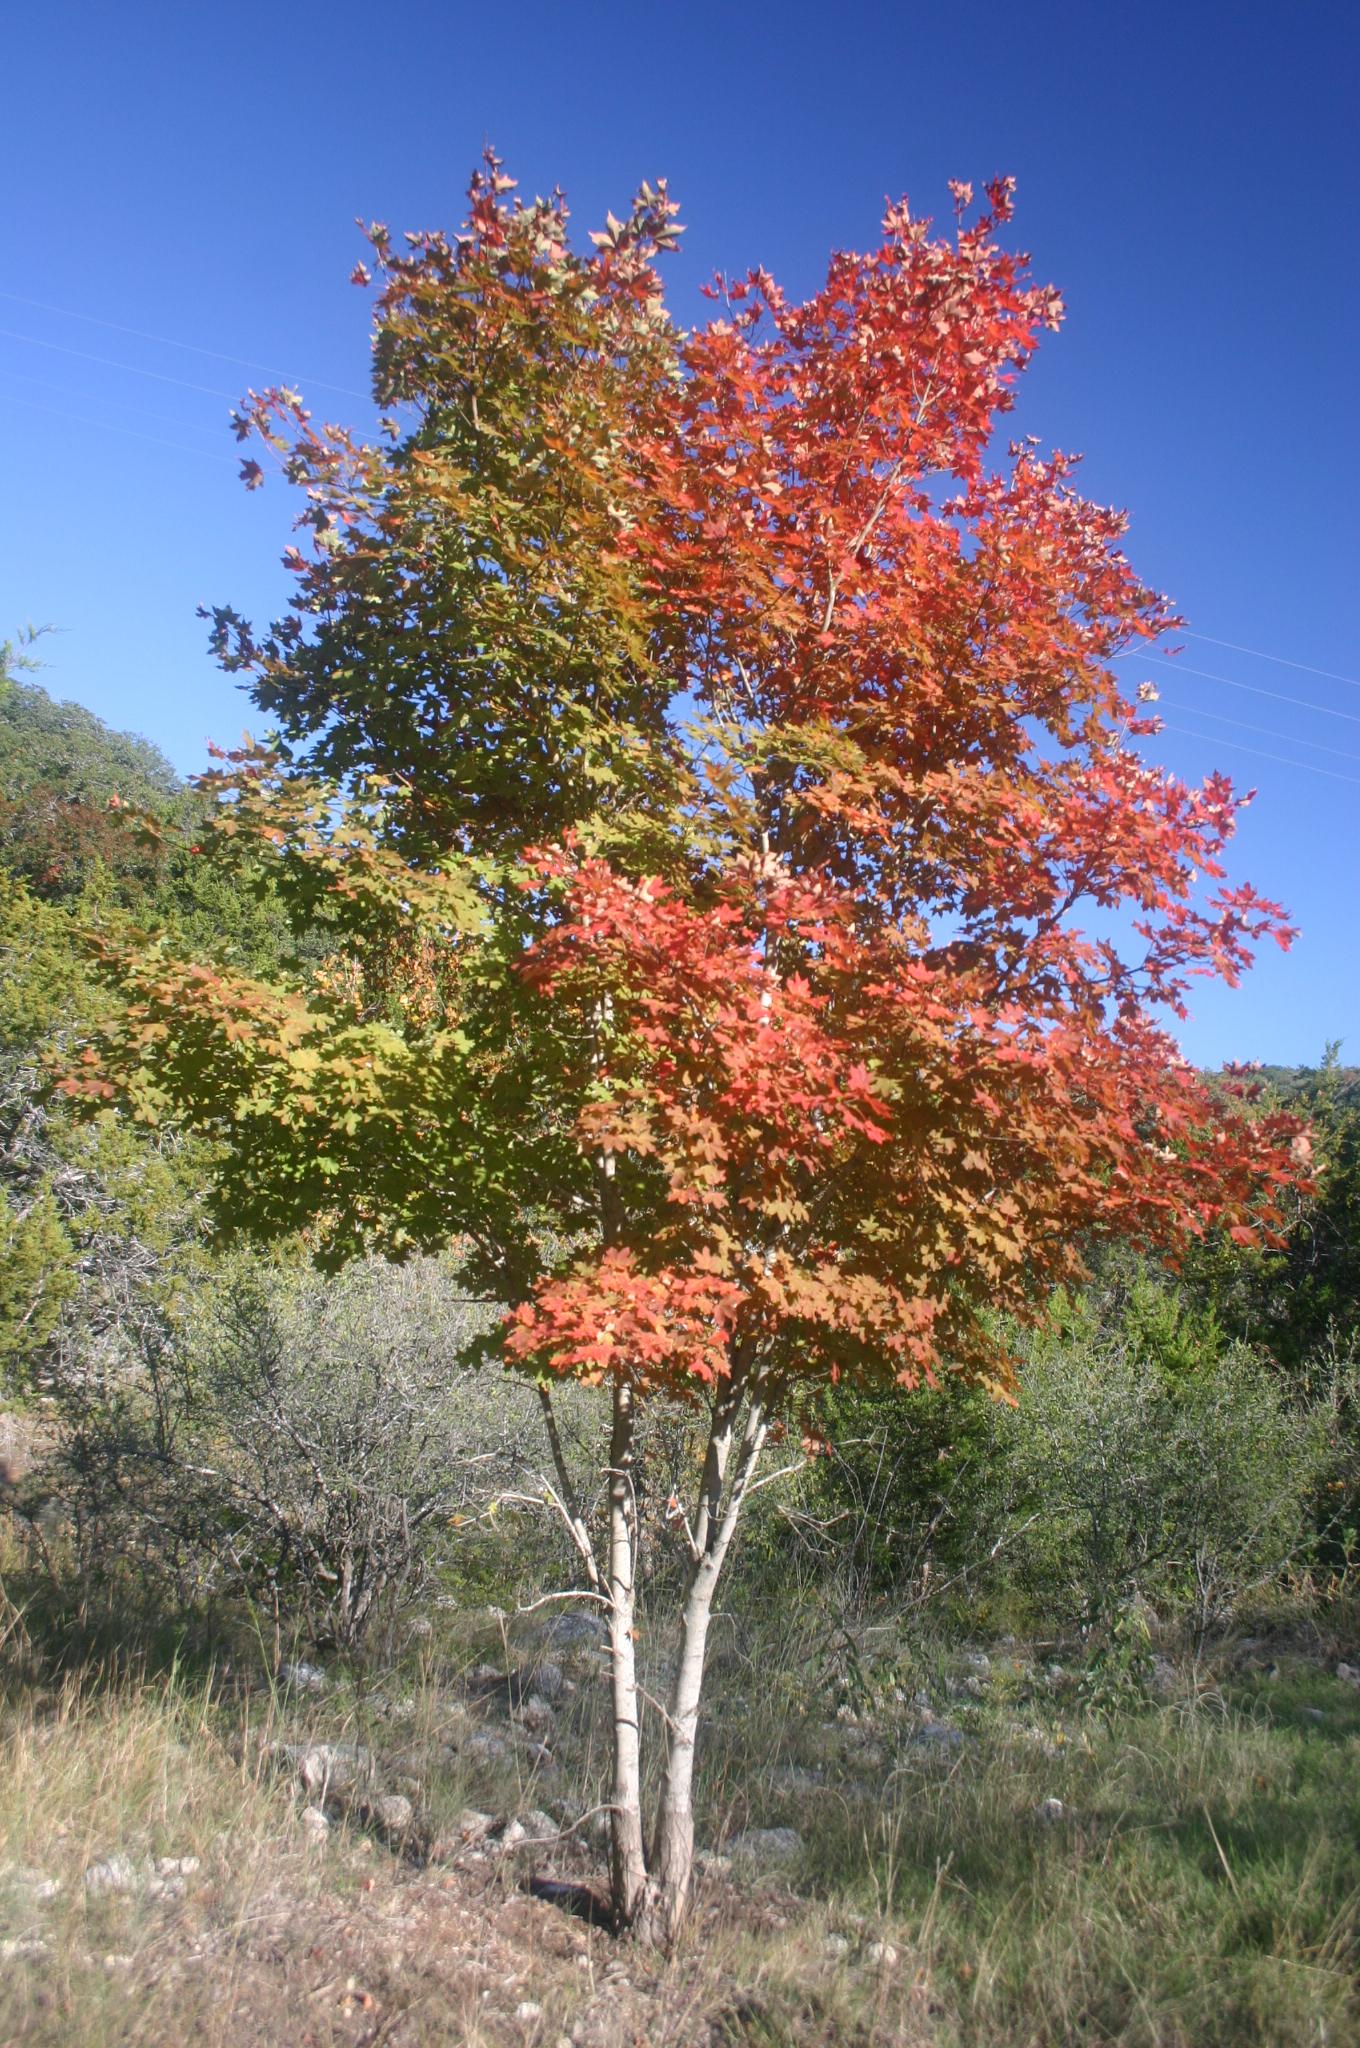 File:Bi-colored Maple Tree.jpg - Wikimedia Commons